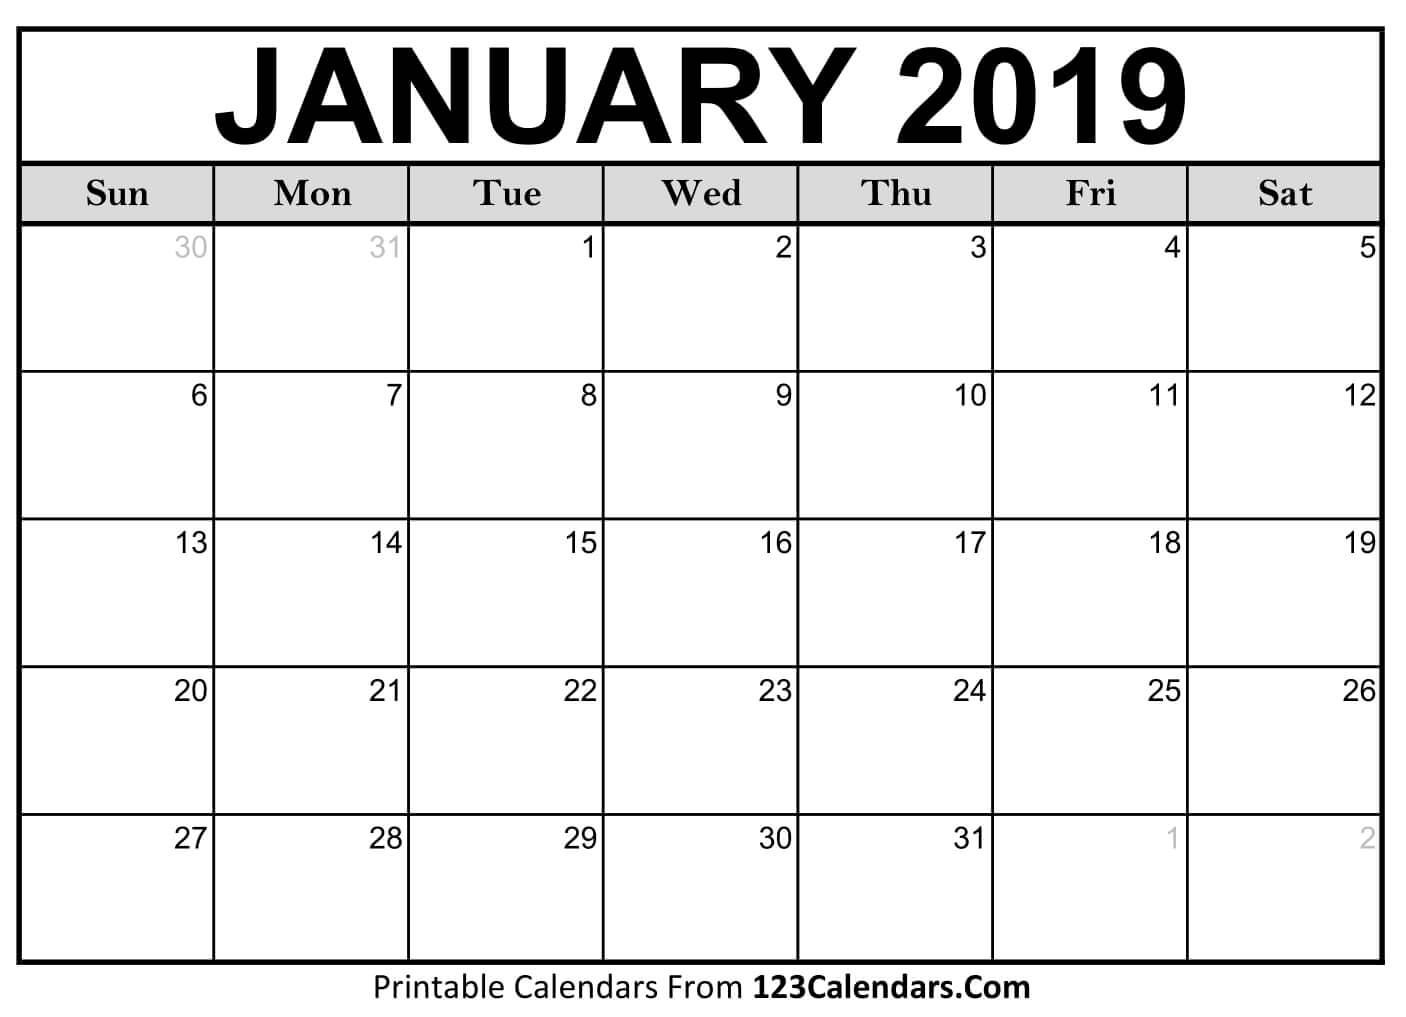 January Calendar Printable 2019